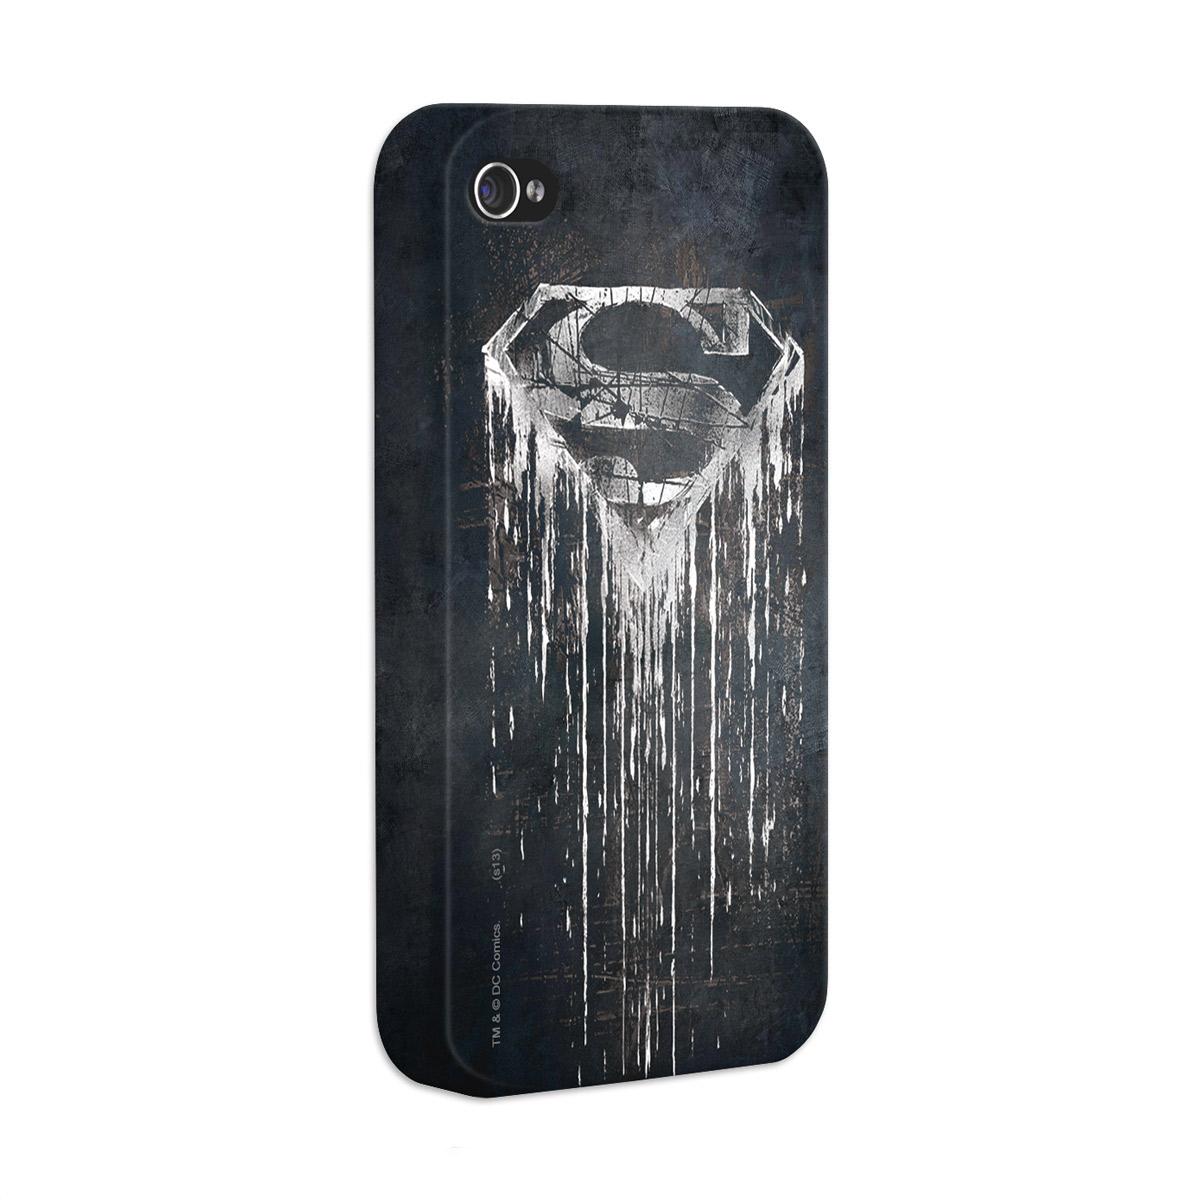 Capa de iPhone 4/4S Superman - Steel Melting